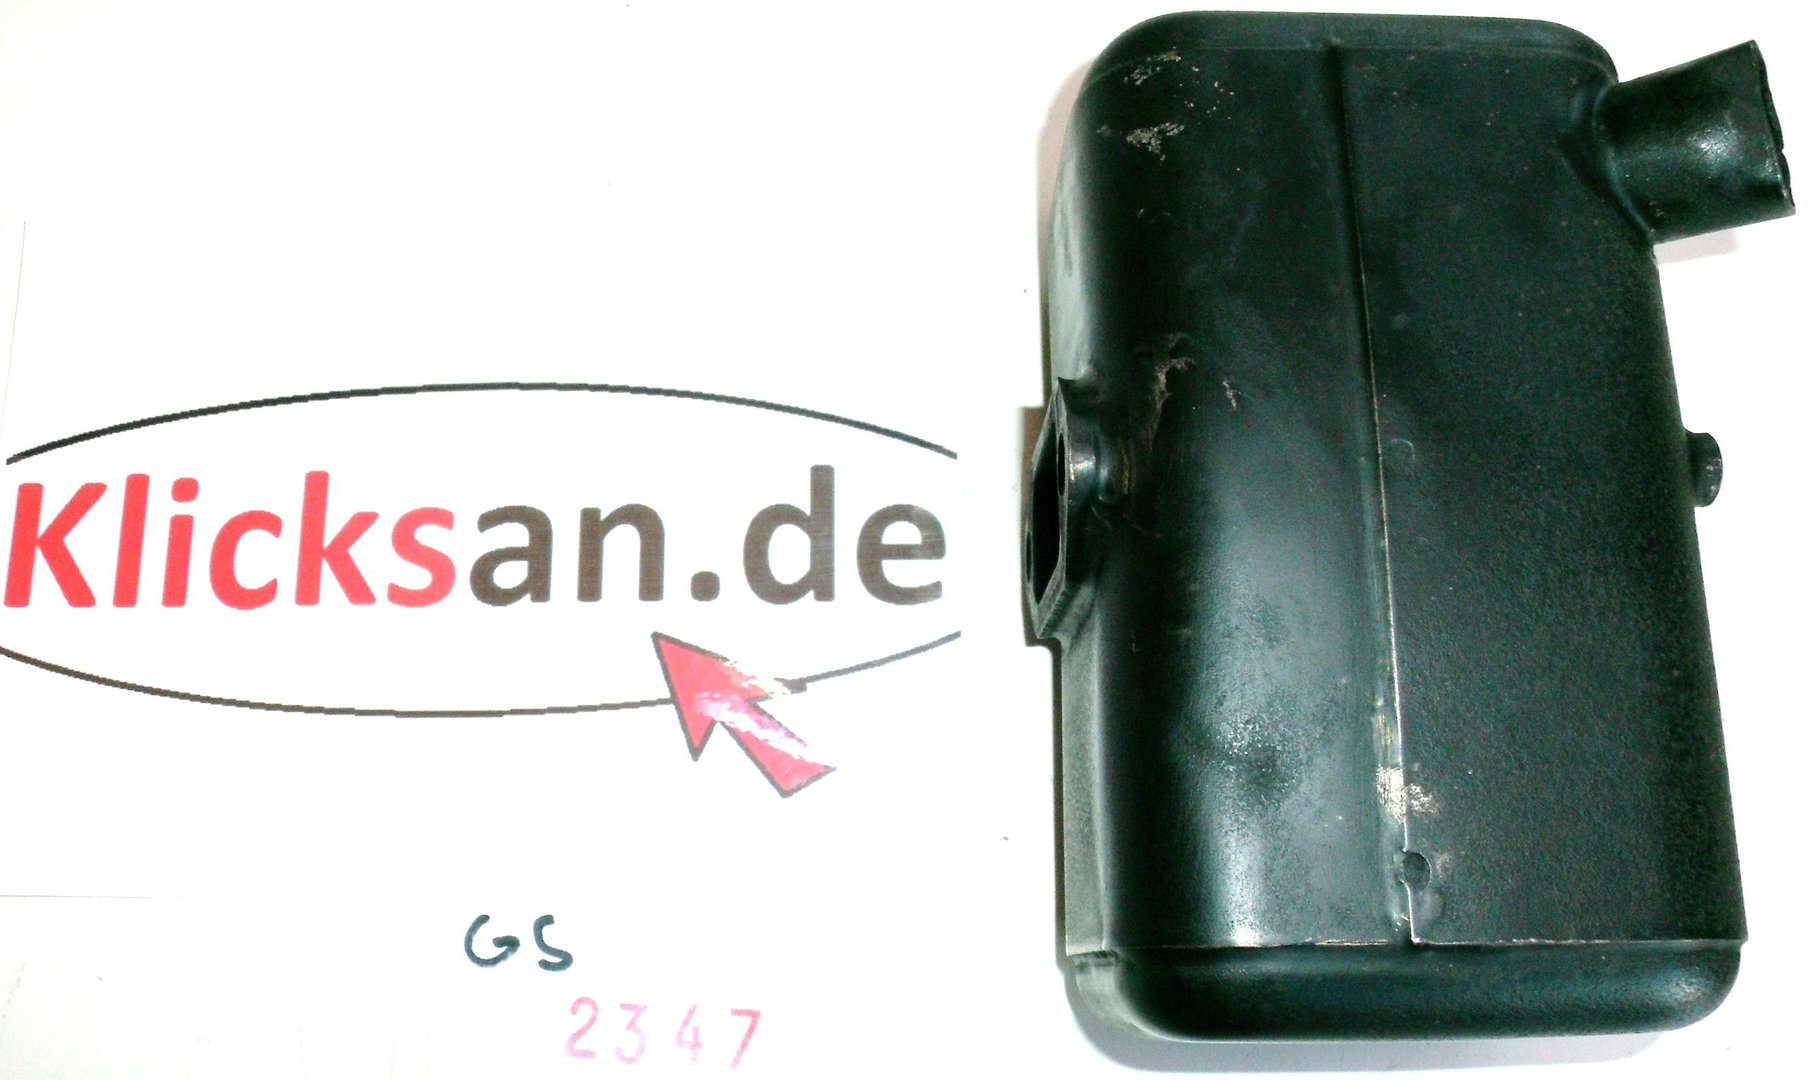 farymann 15d430 ersatzteile auspuff kaufen gs2347. Black Bedroom Furniture Sets. Home Design Ideas